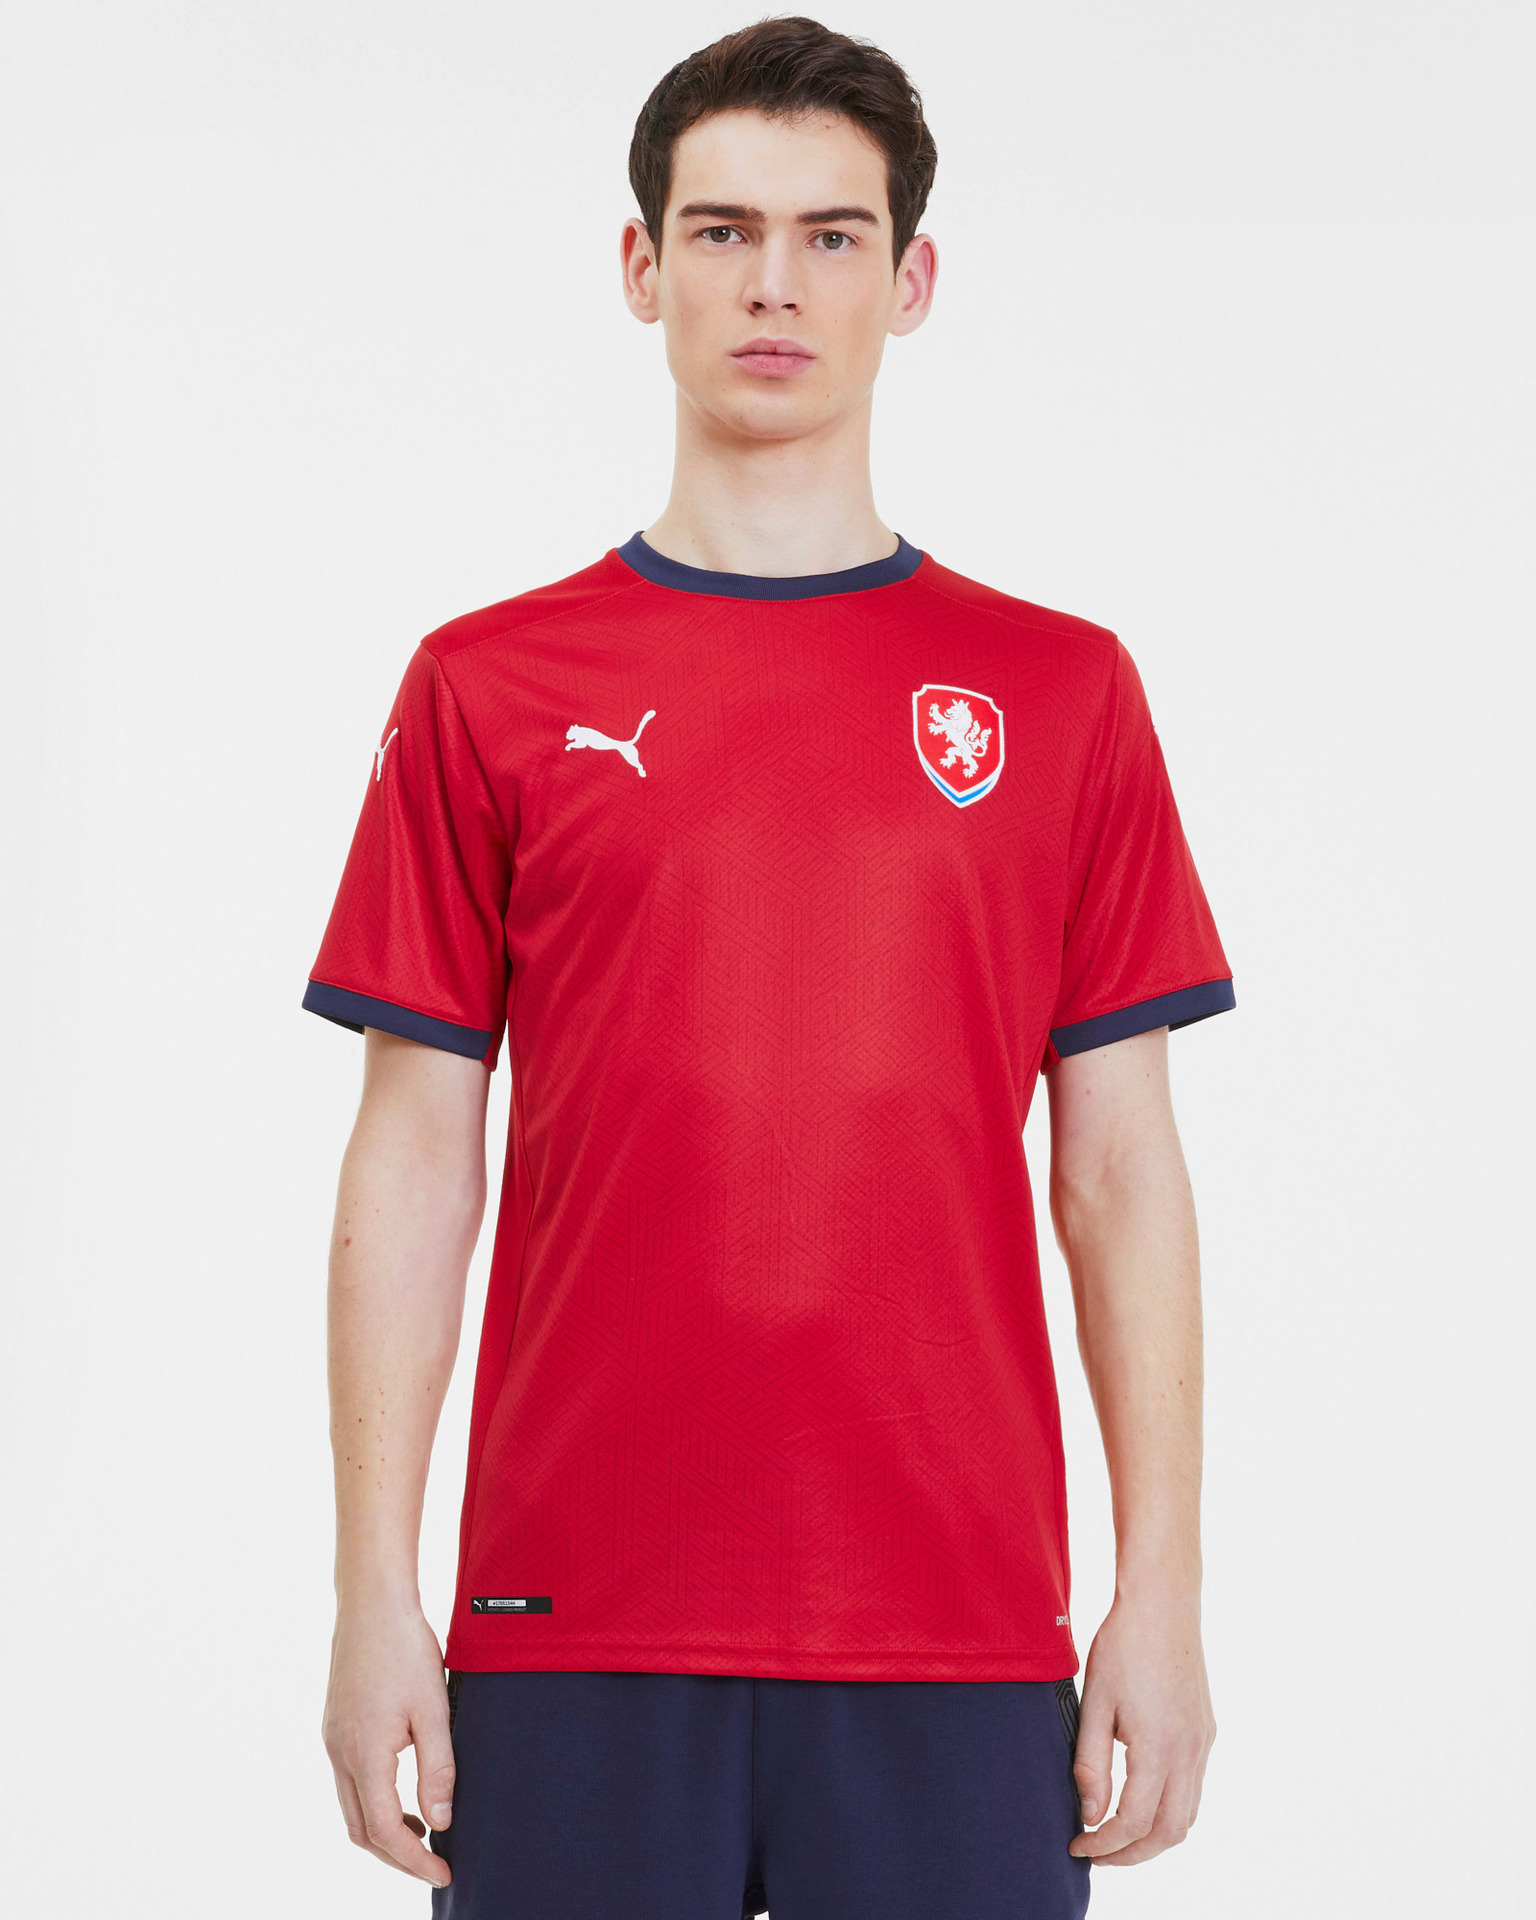 Puma - Czech Republic T-shirt Bibloo.com